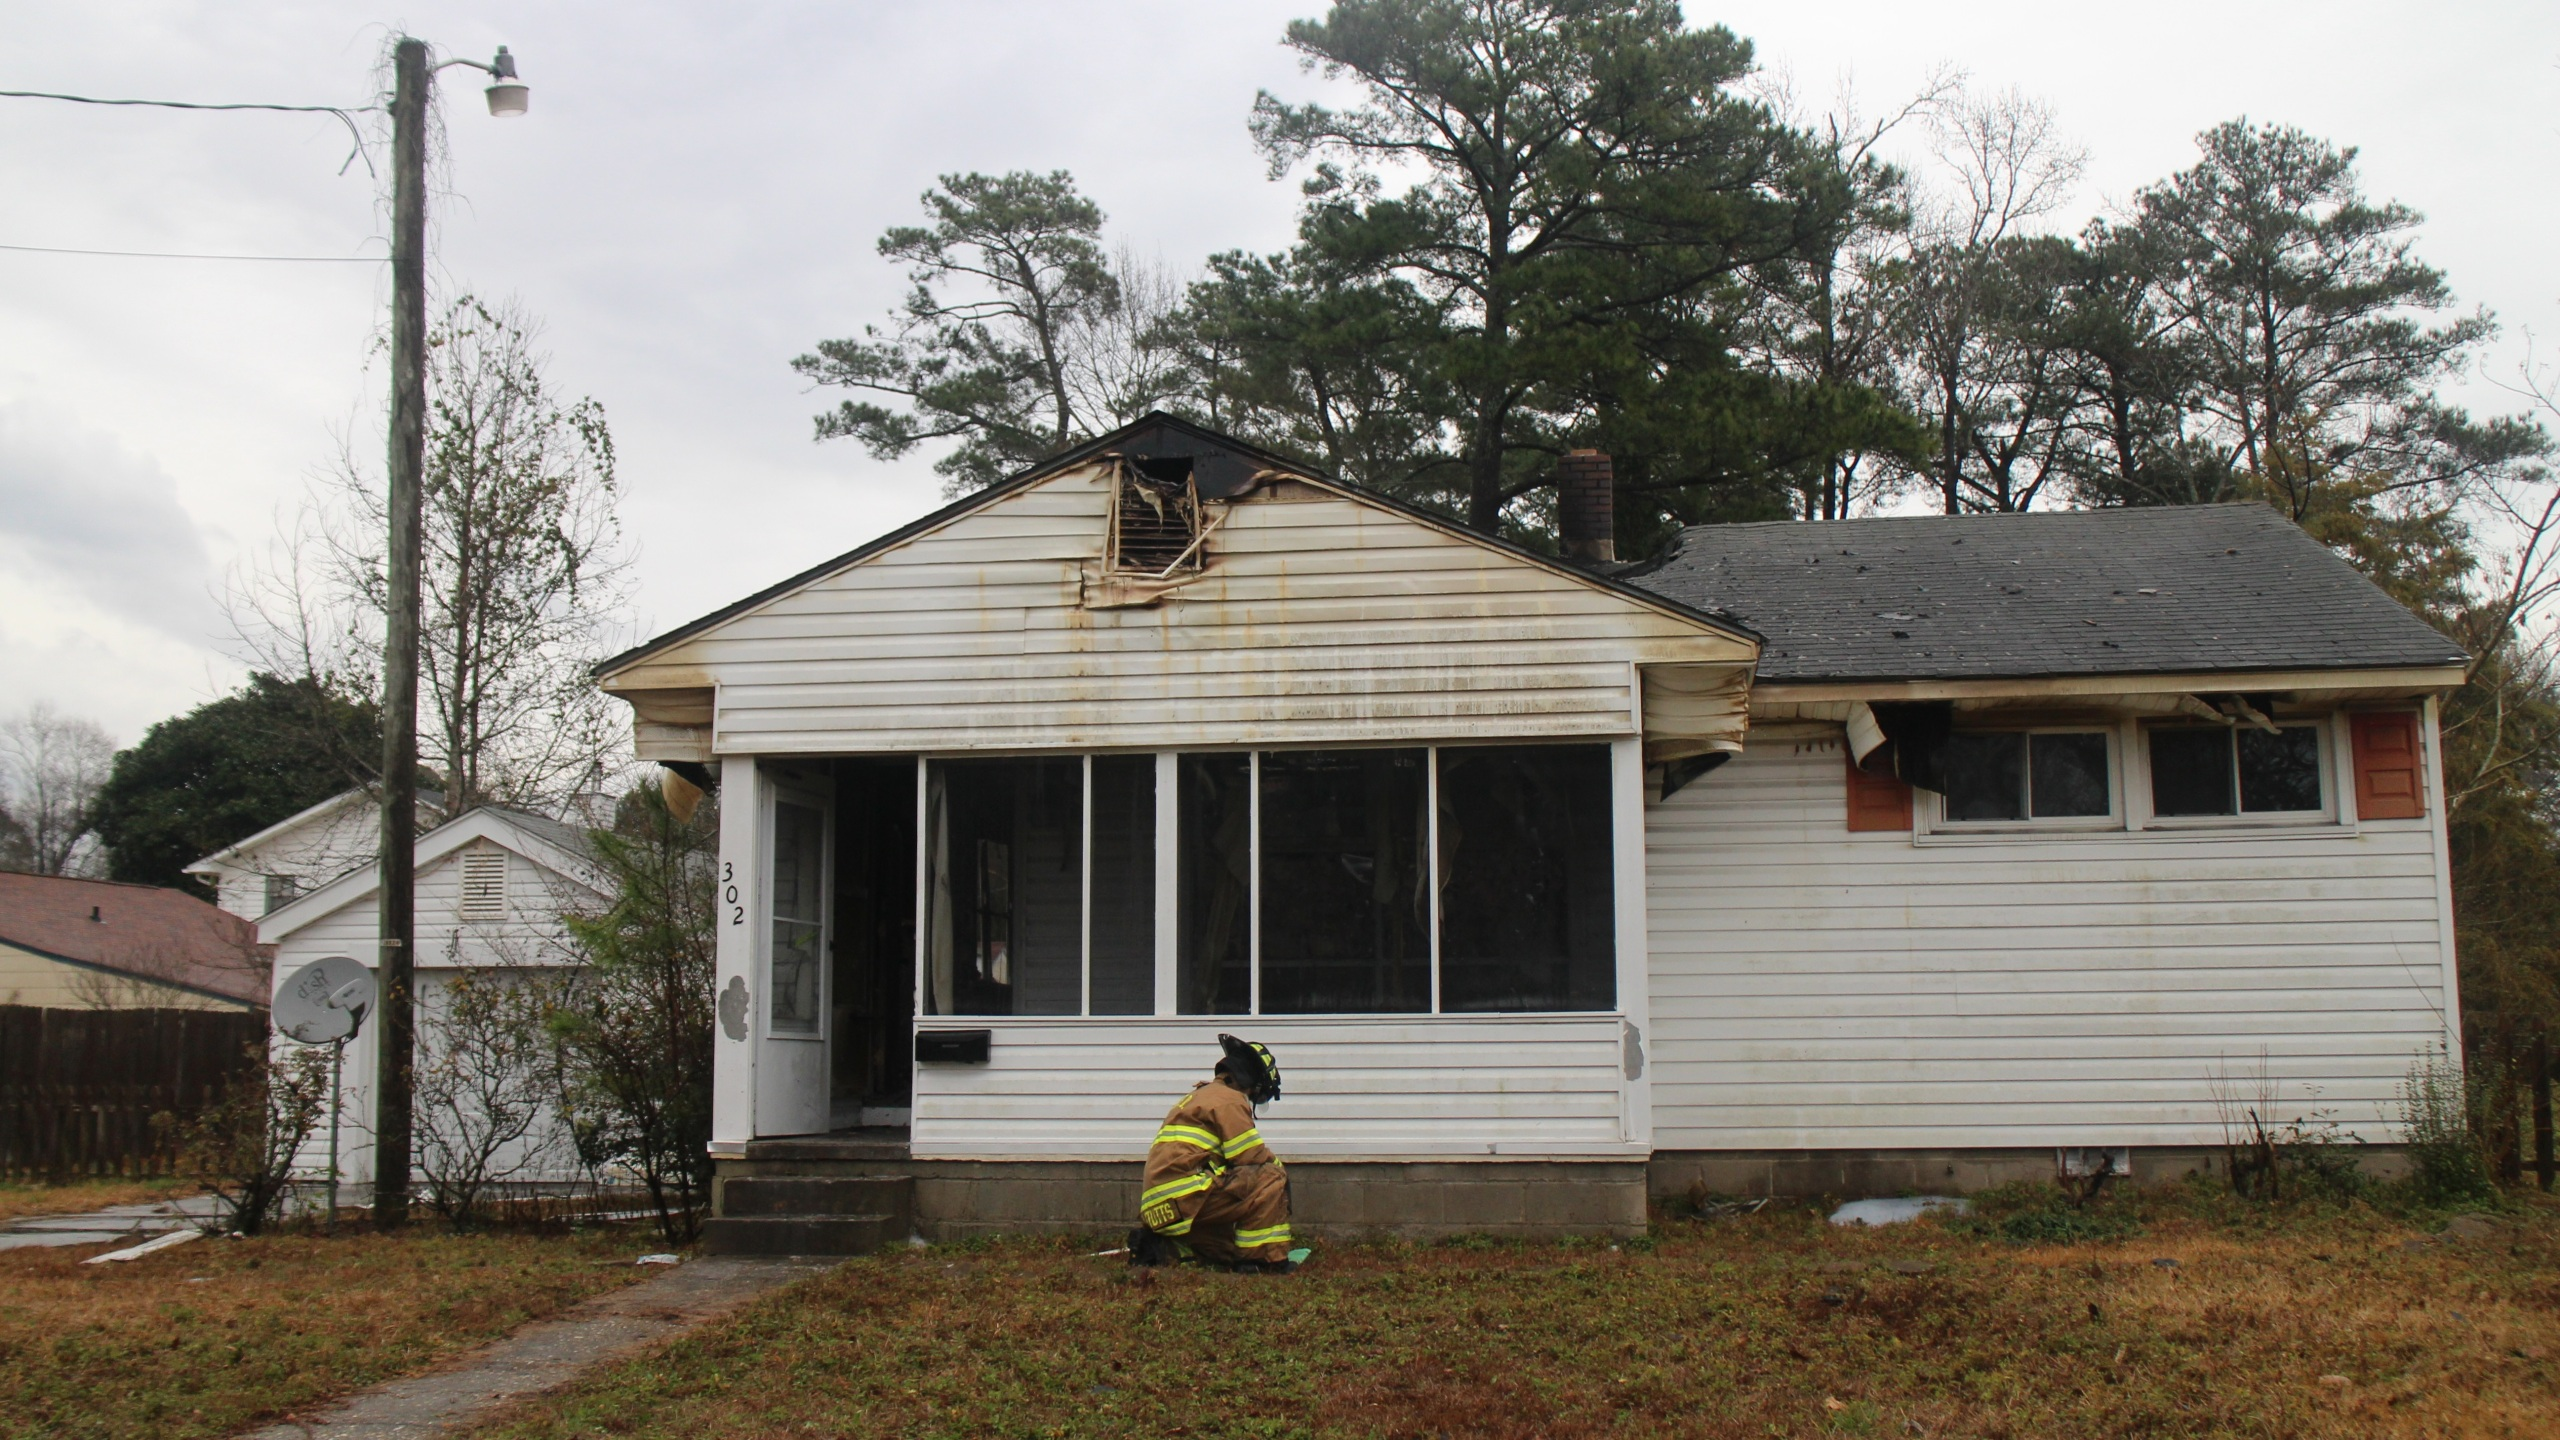 jacksonville-house-fire_346650